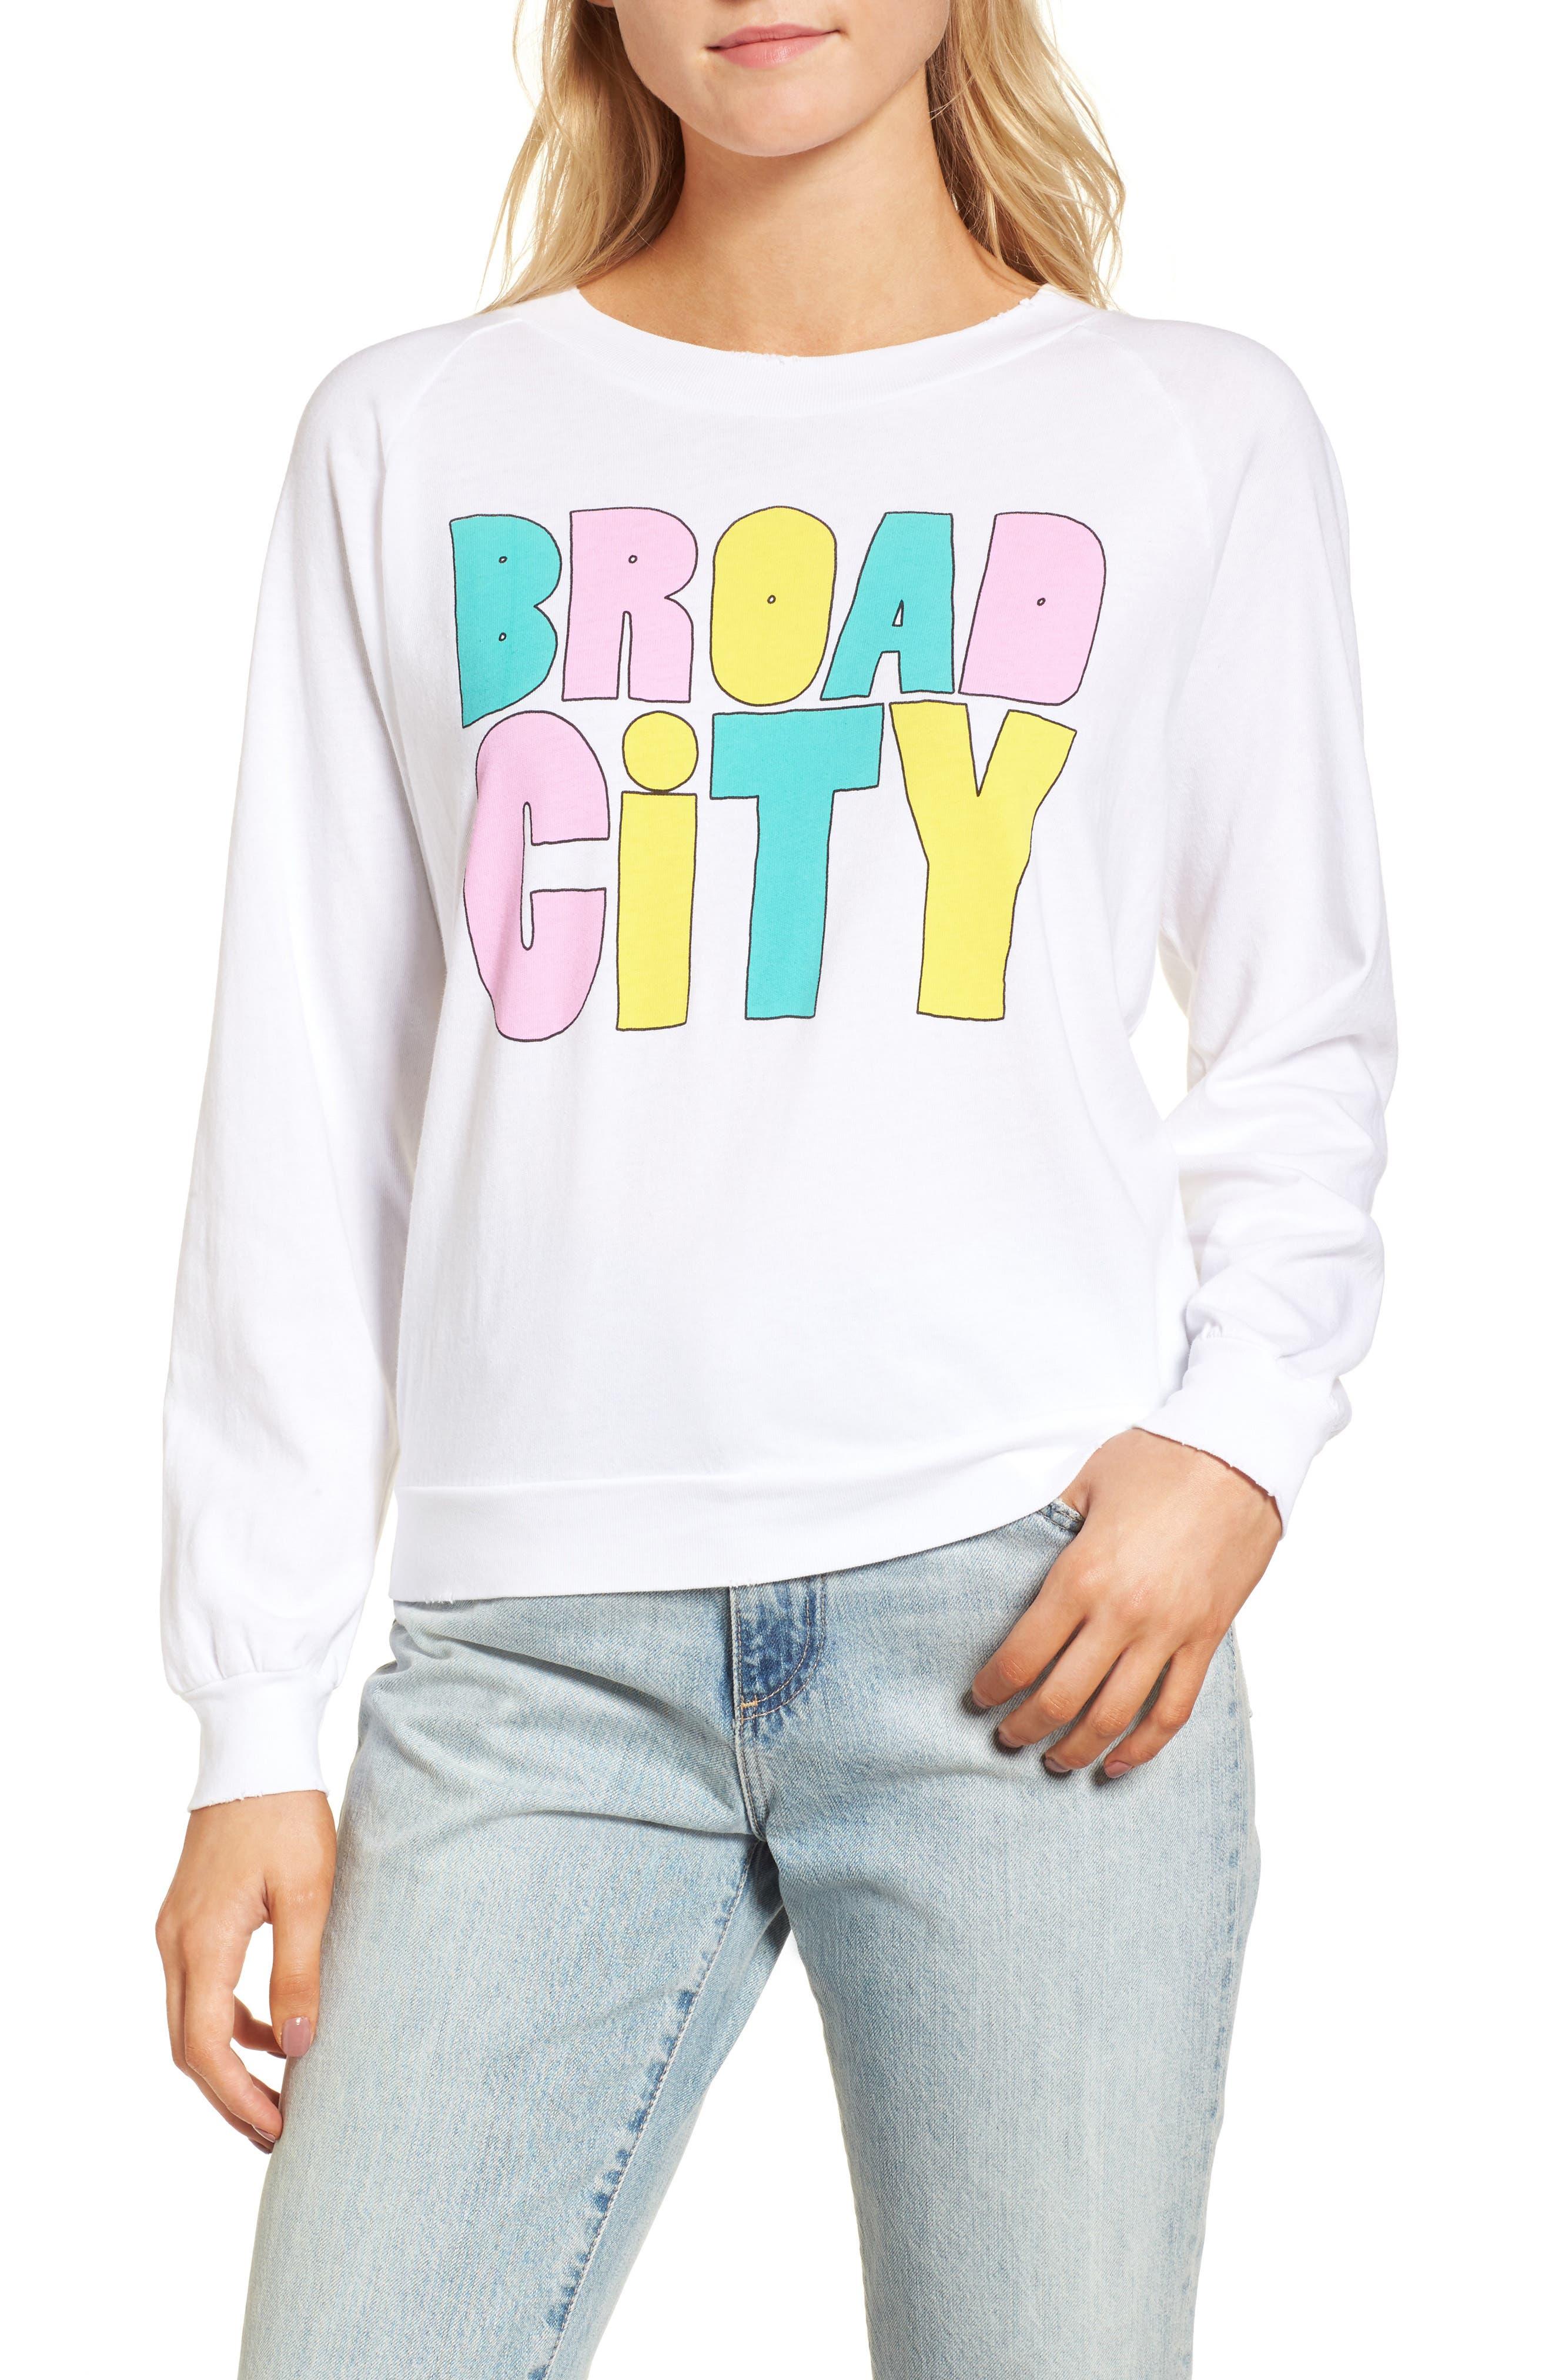 Broad City Cotton Graphic Sweatshirt,                             Main thumbnail 1, color,                             100